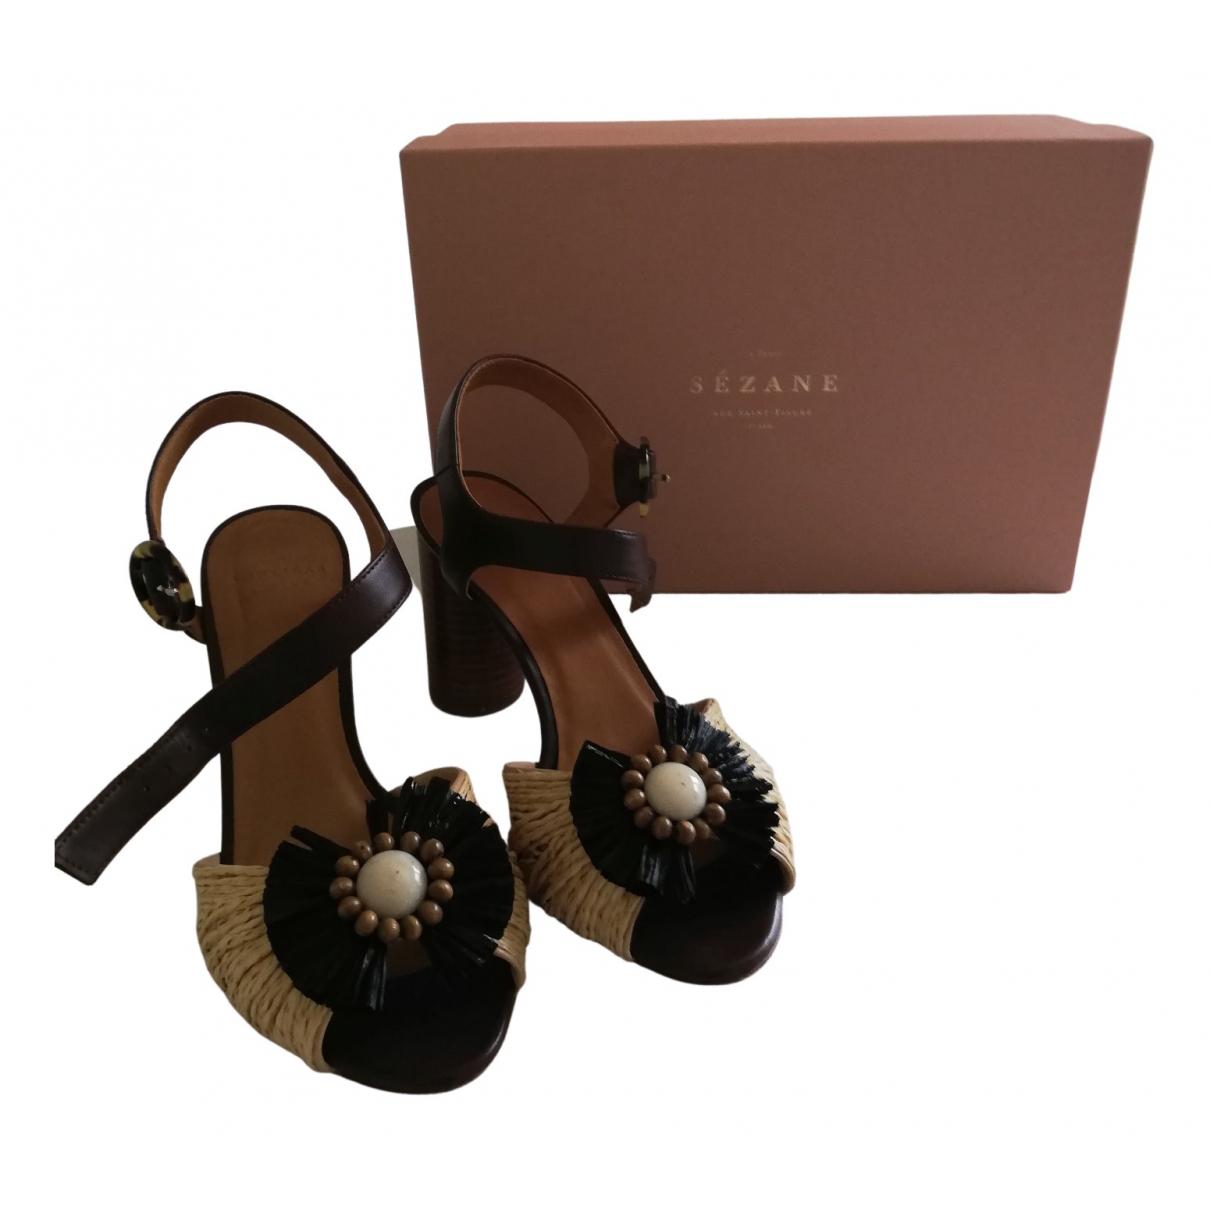 Sézane Spring Summer 2020 Camel Leather Sandals for Women 36 EU